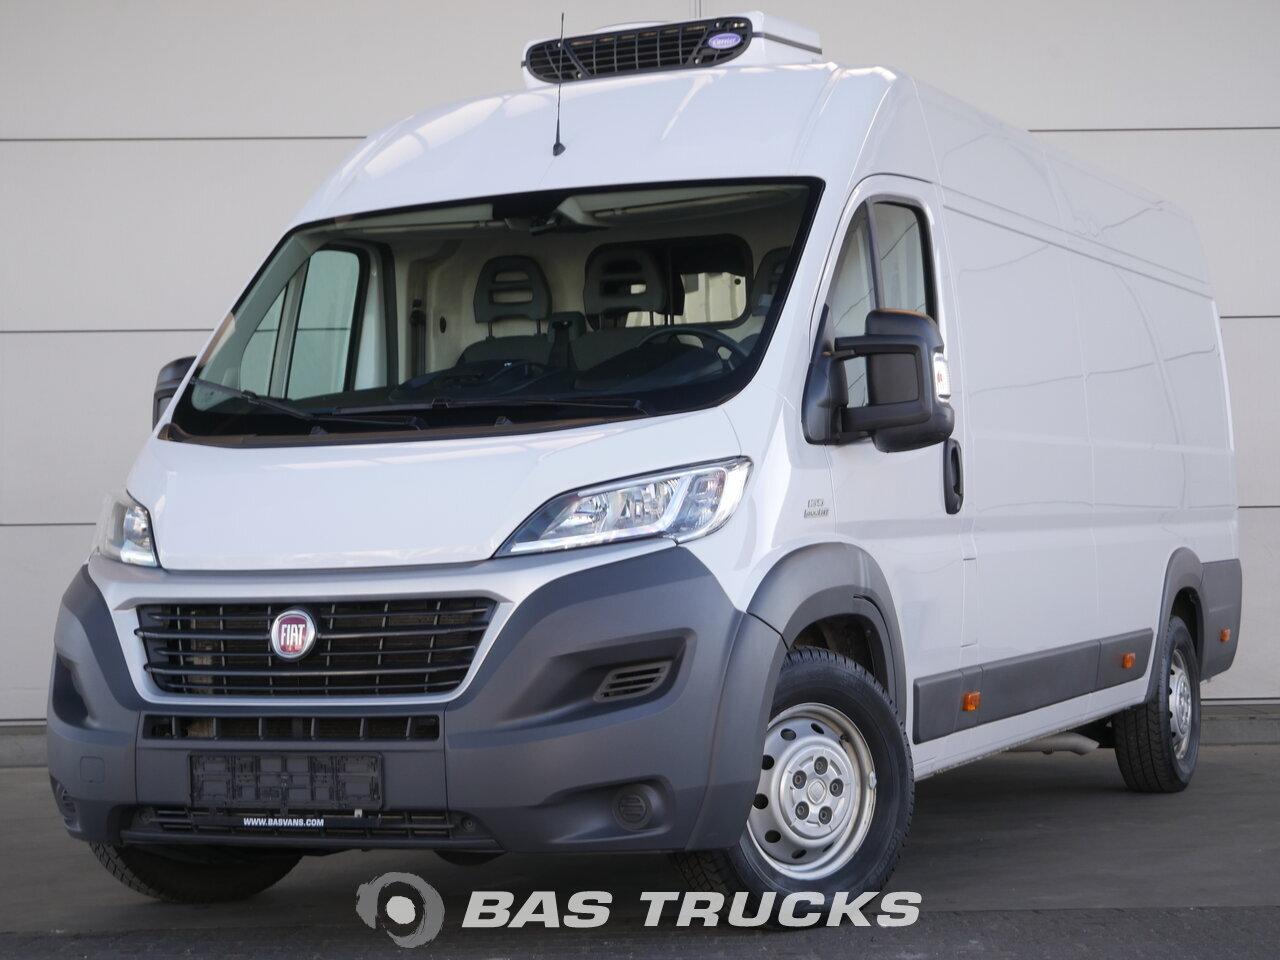 fiat ducato samoch d dostawczy 24400 bas trucks. Black Bedroom Furniture Sets. Home Design Ideas